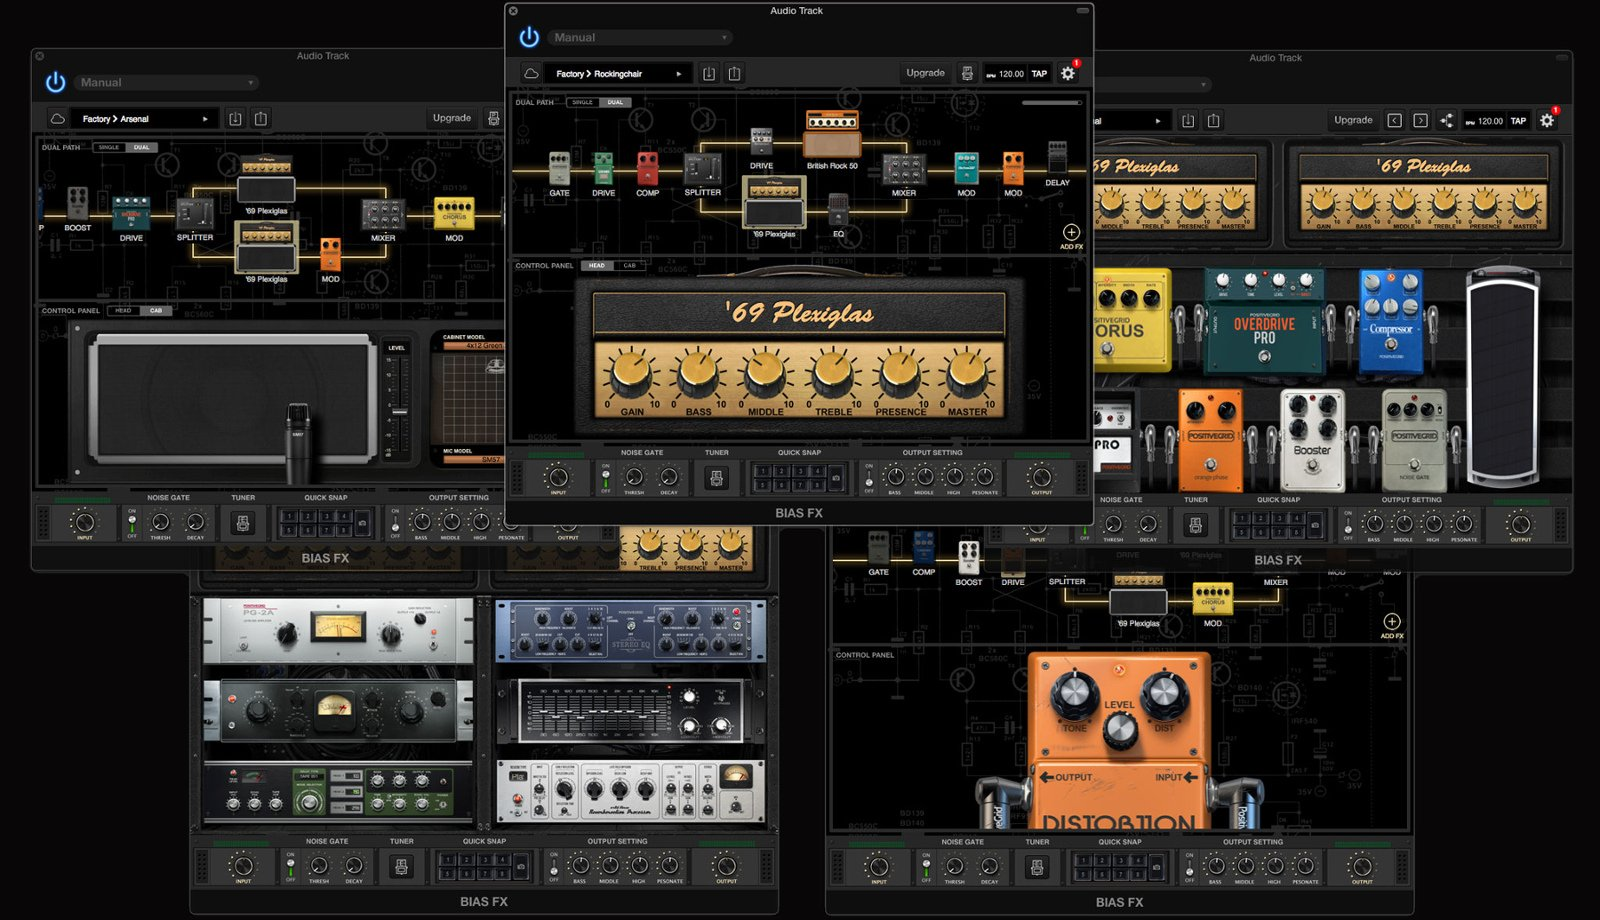 Professional Amp & FX Modeling Software